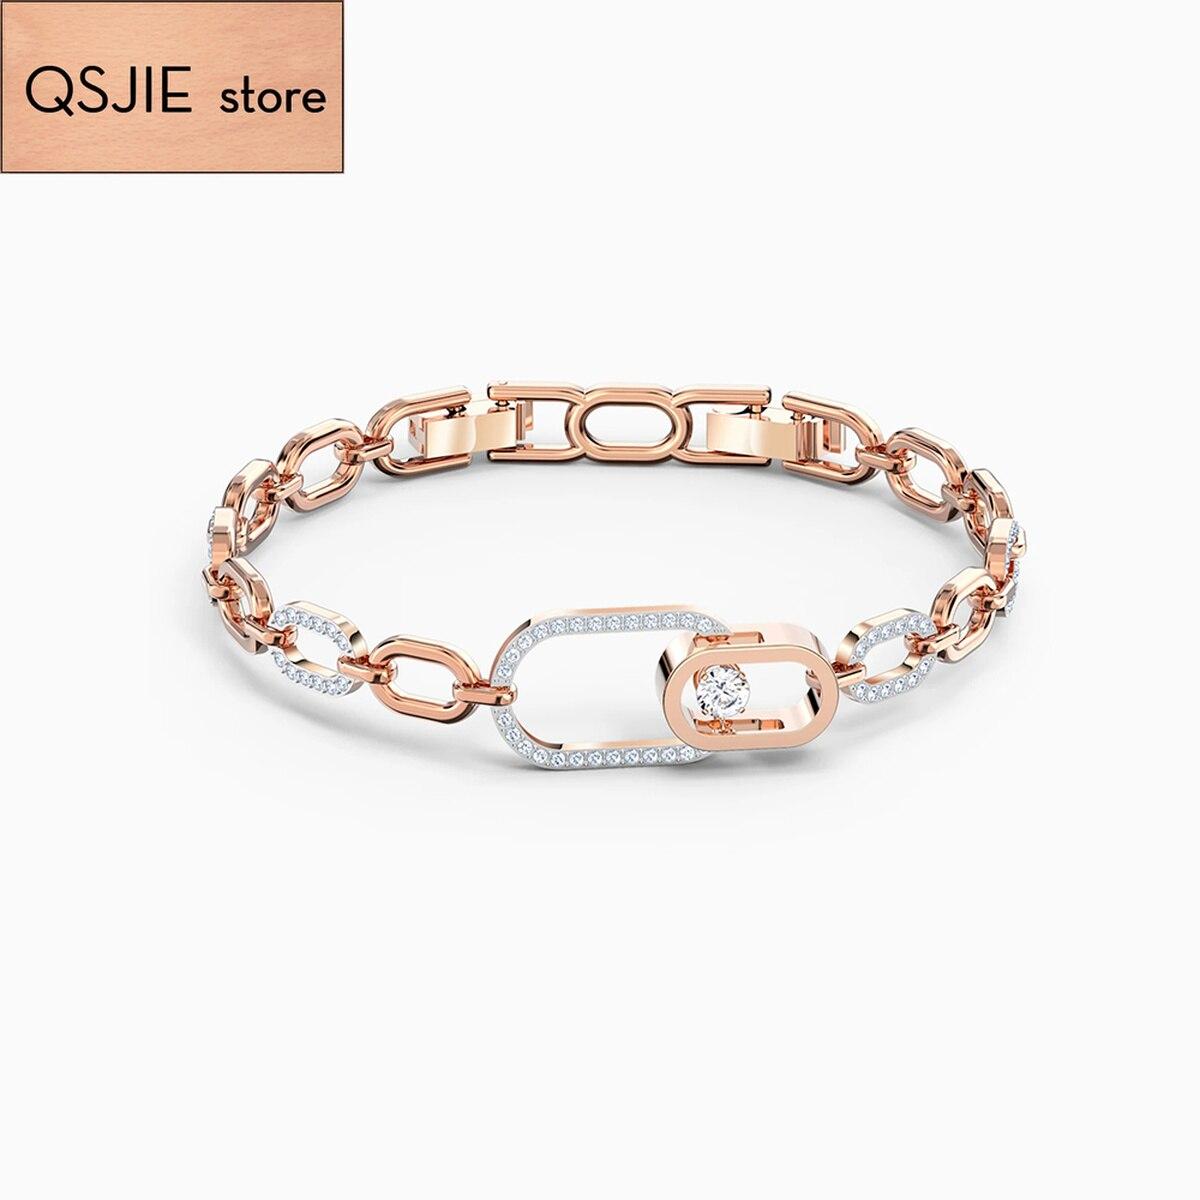 QSJIE Swa1: 1 fashionable layered hollow oval CLASP BRACELET smart oval Rose Gold Bracelet Glamorous fashion jewelry